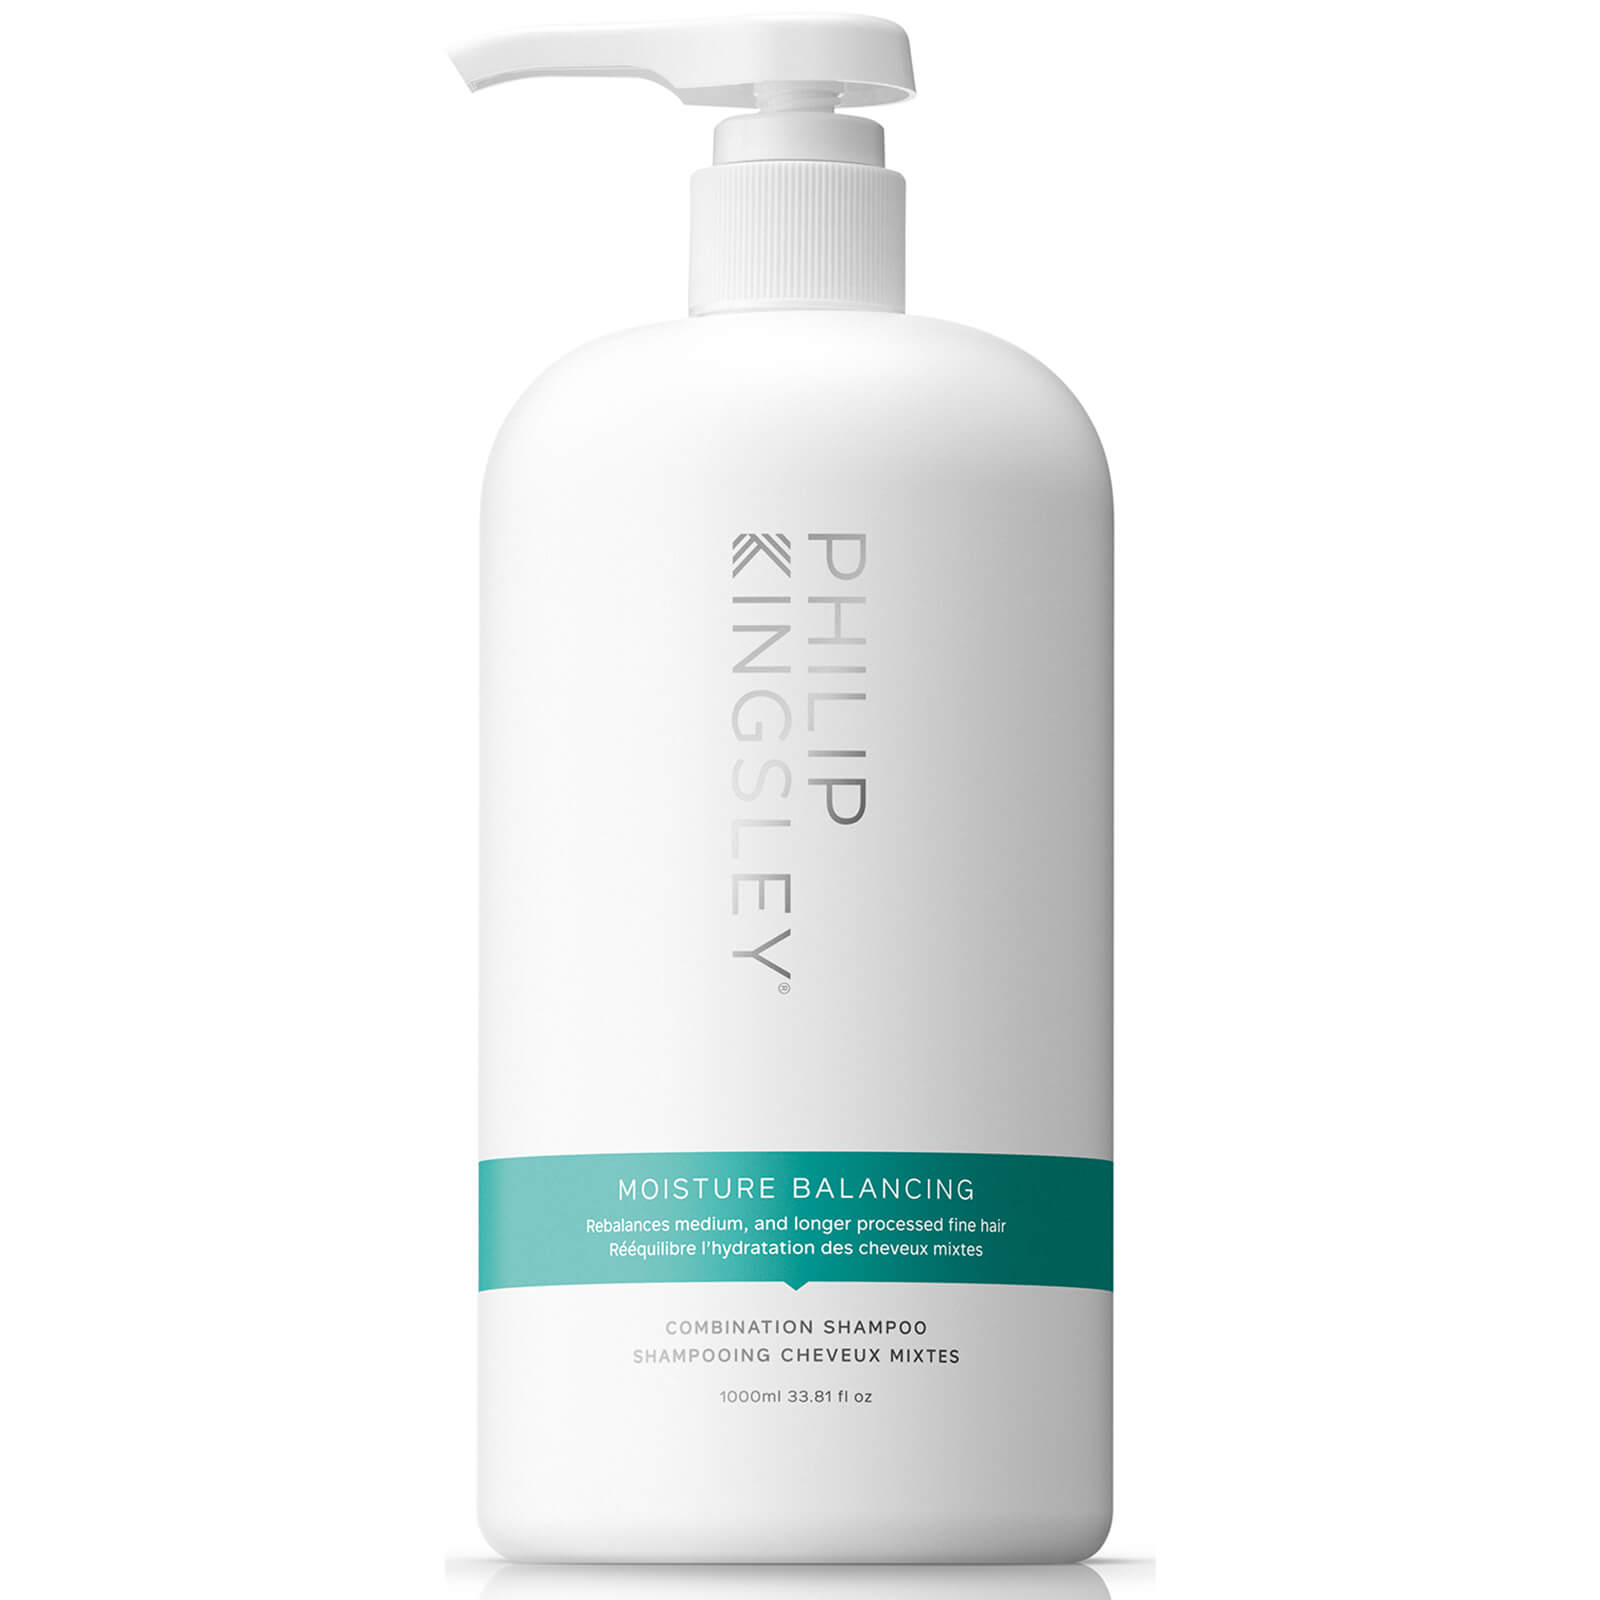 Philip Kingsley - Moisture Balancing Shampoo 1000 ml